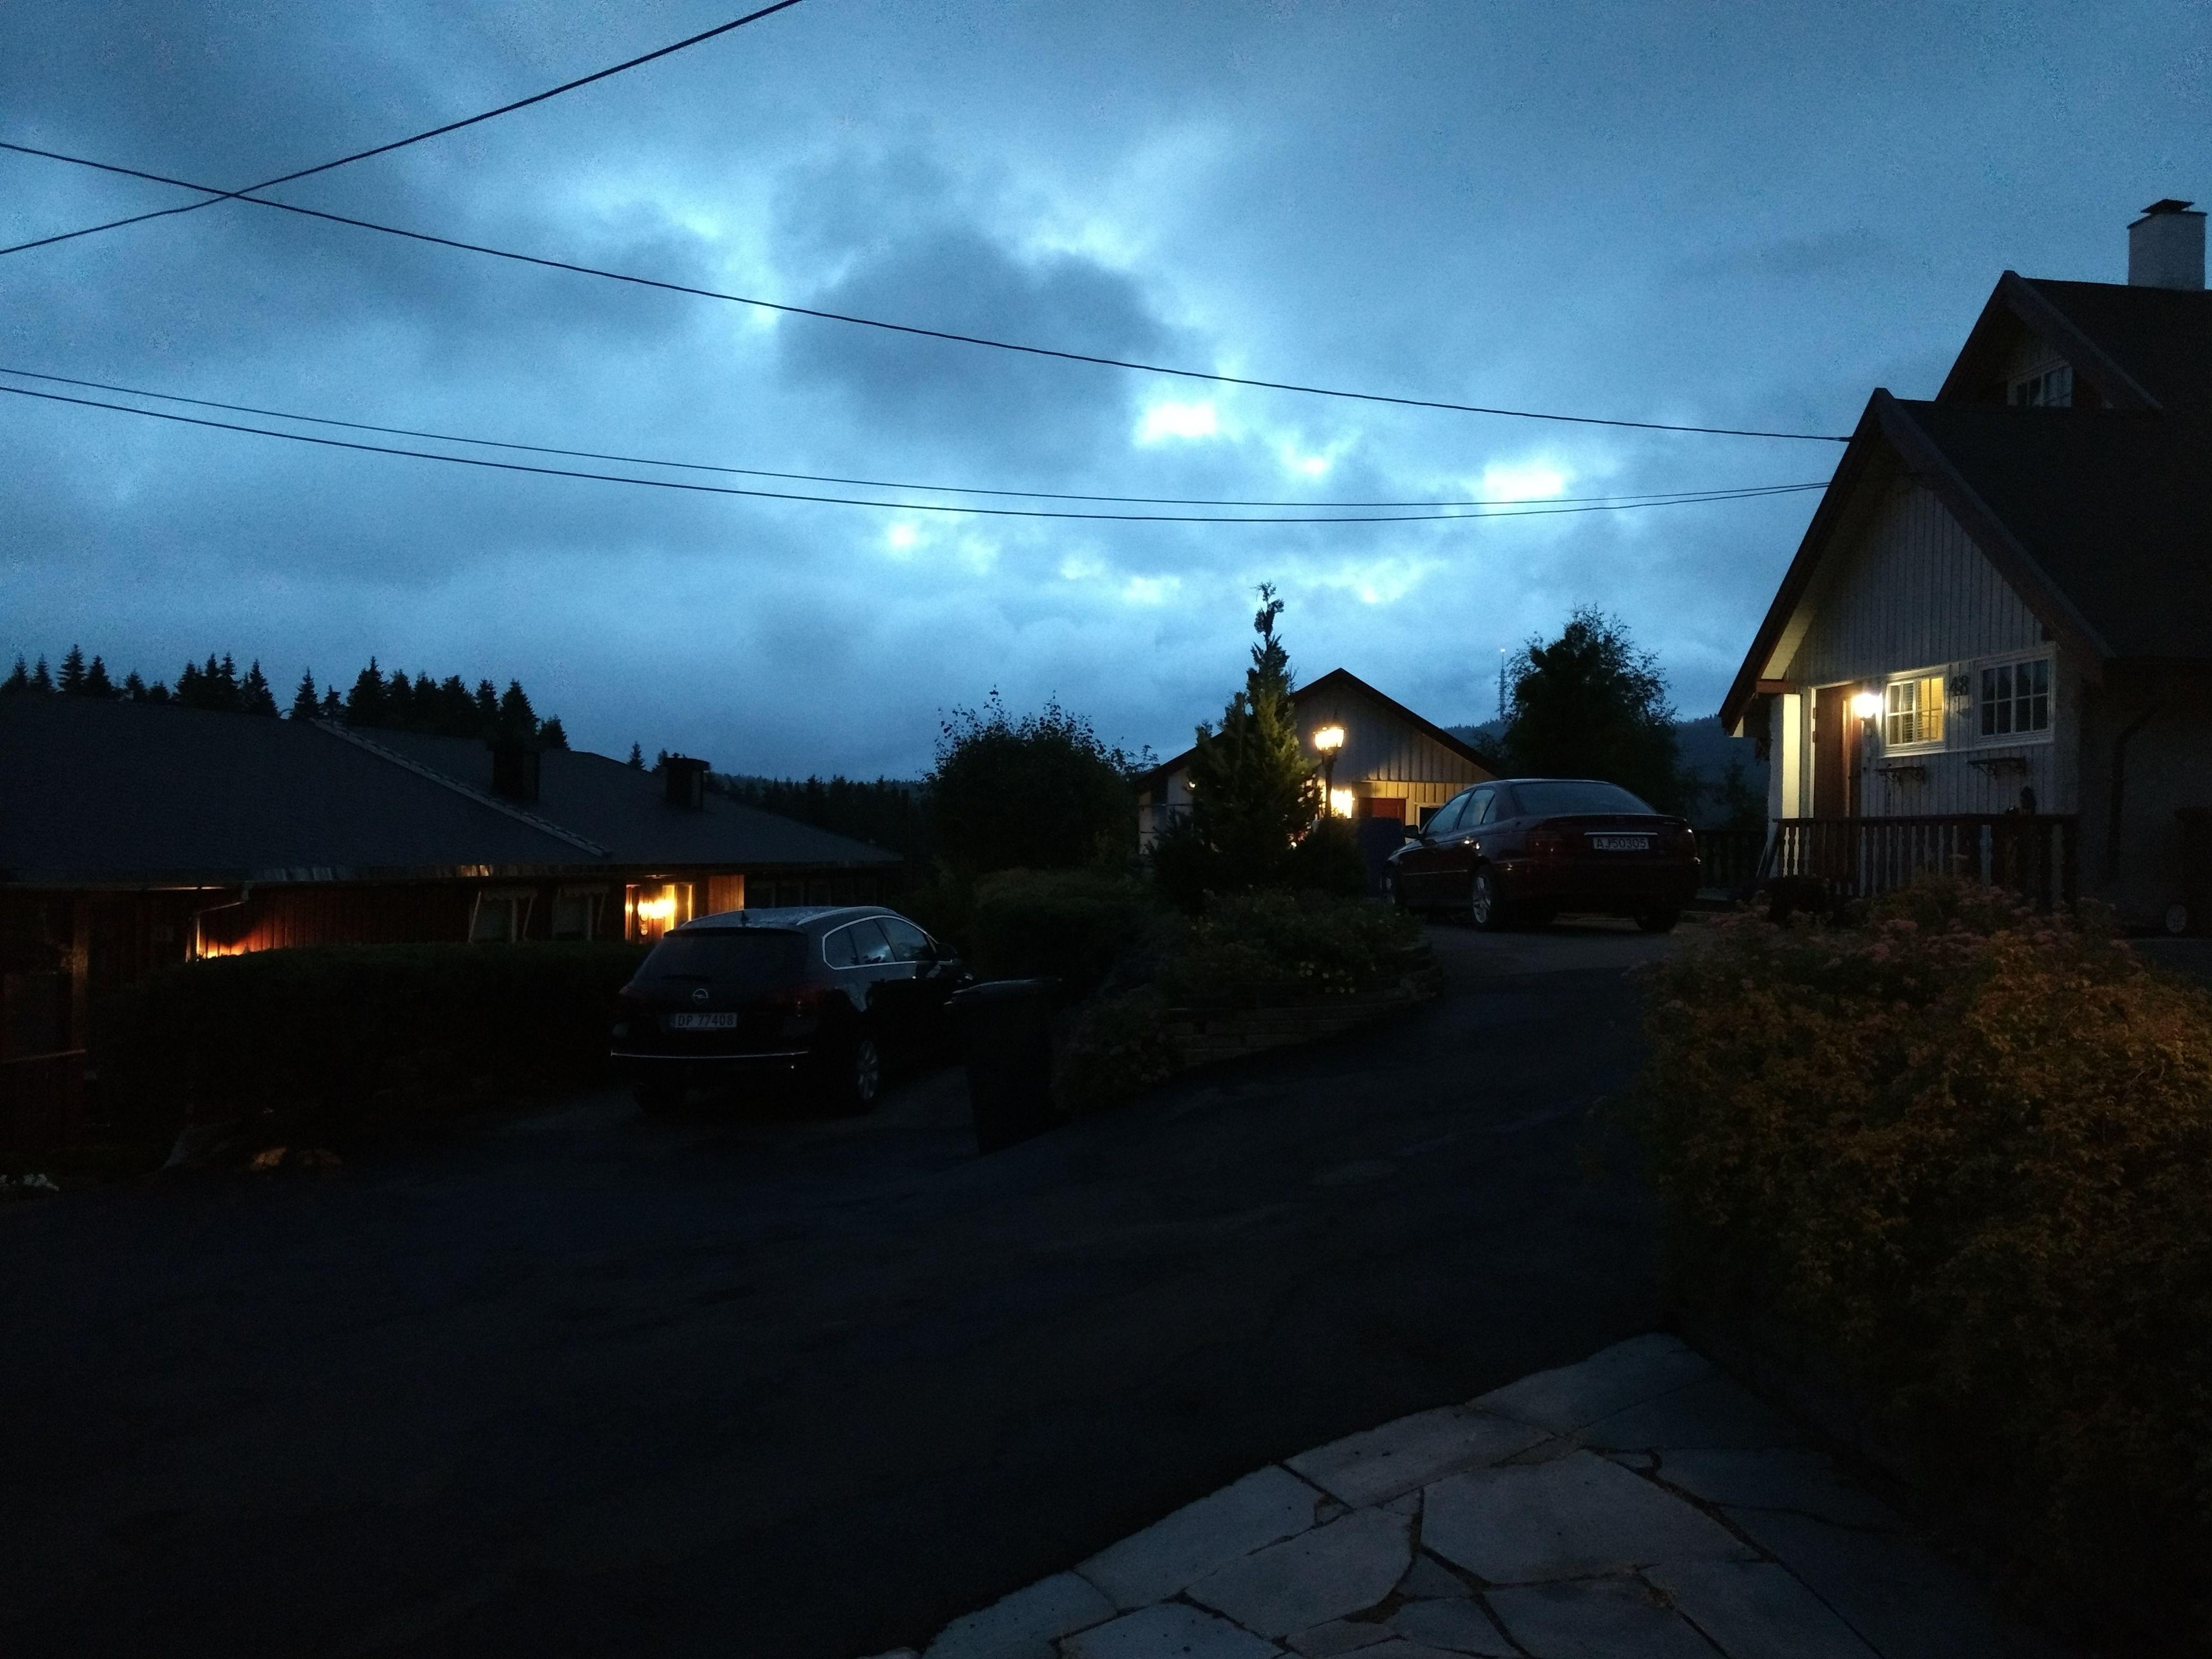 Stummende mørke og håndholdt fotografering kan faktisk gå helt greit med Moto G4 Plus.